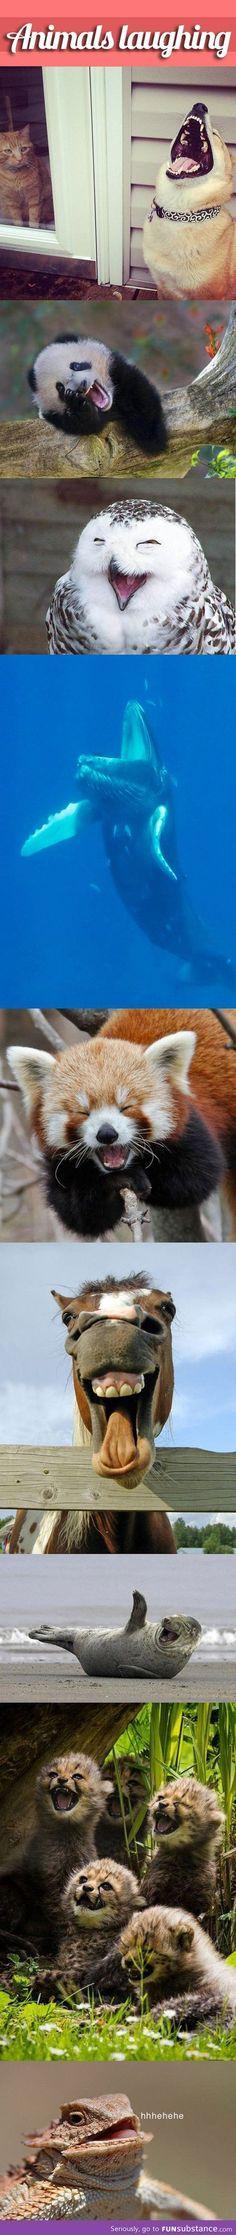 Animals laughing. Enough said.